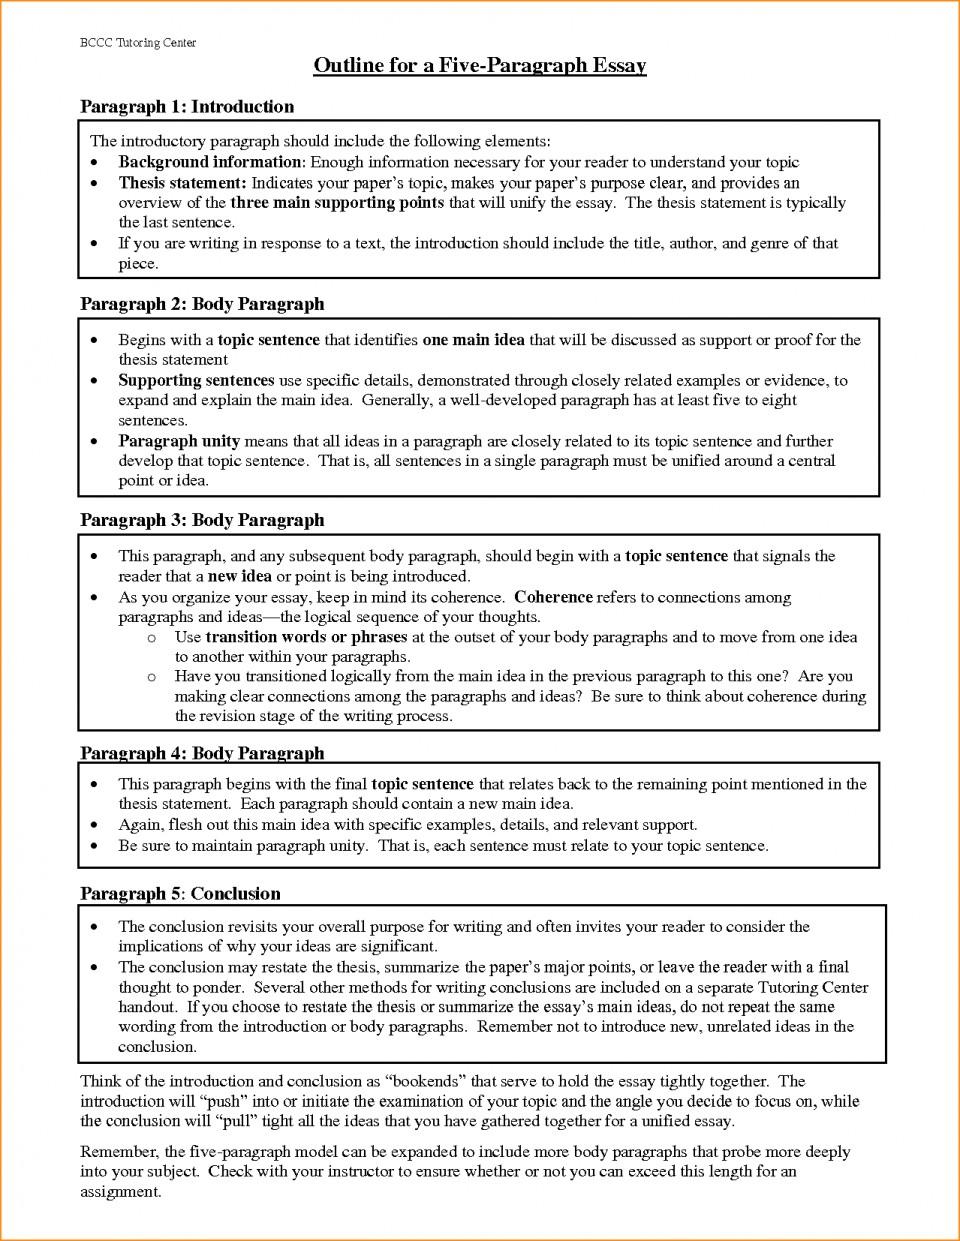 018 Paragraph Essay Outline Example Best Solutions Of Pdf Basic Job Appication Letter Cool Five Impressive 5 Template Argumentative 960